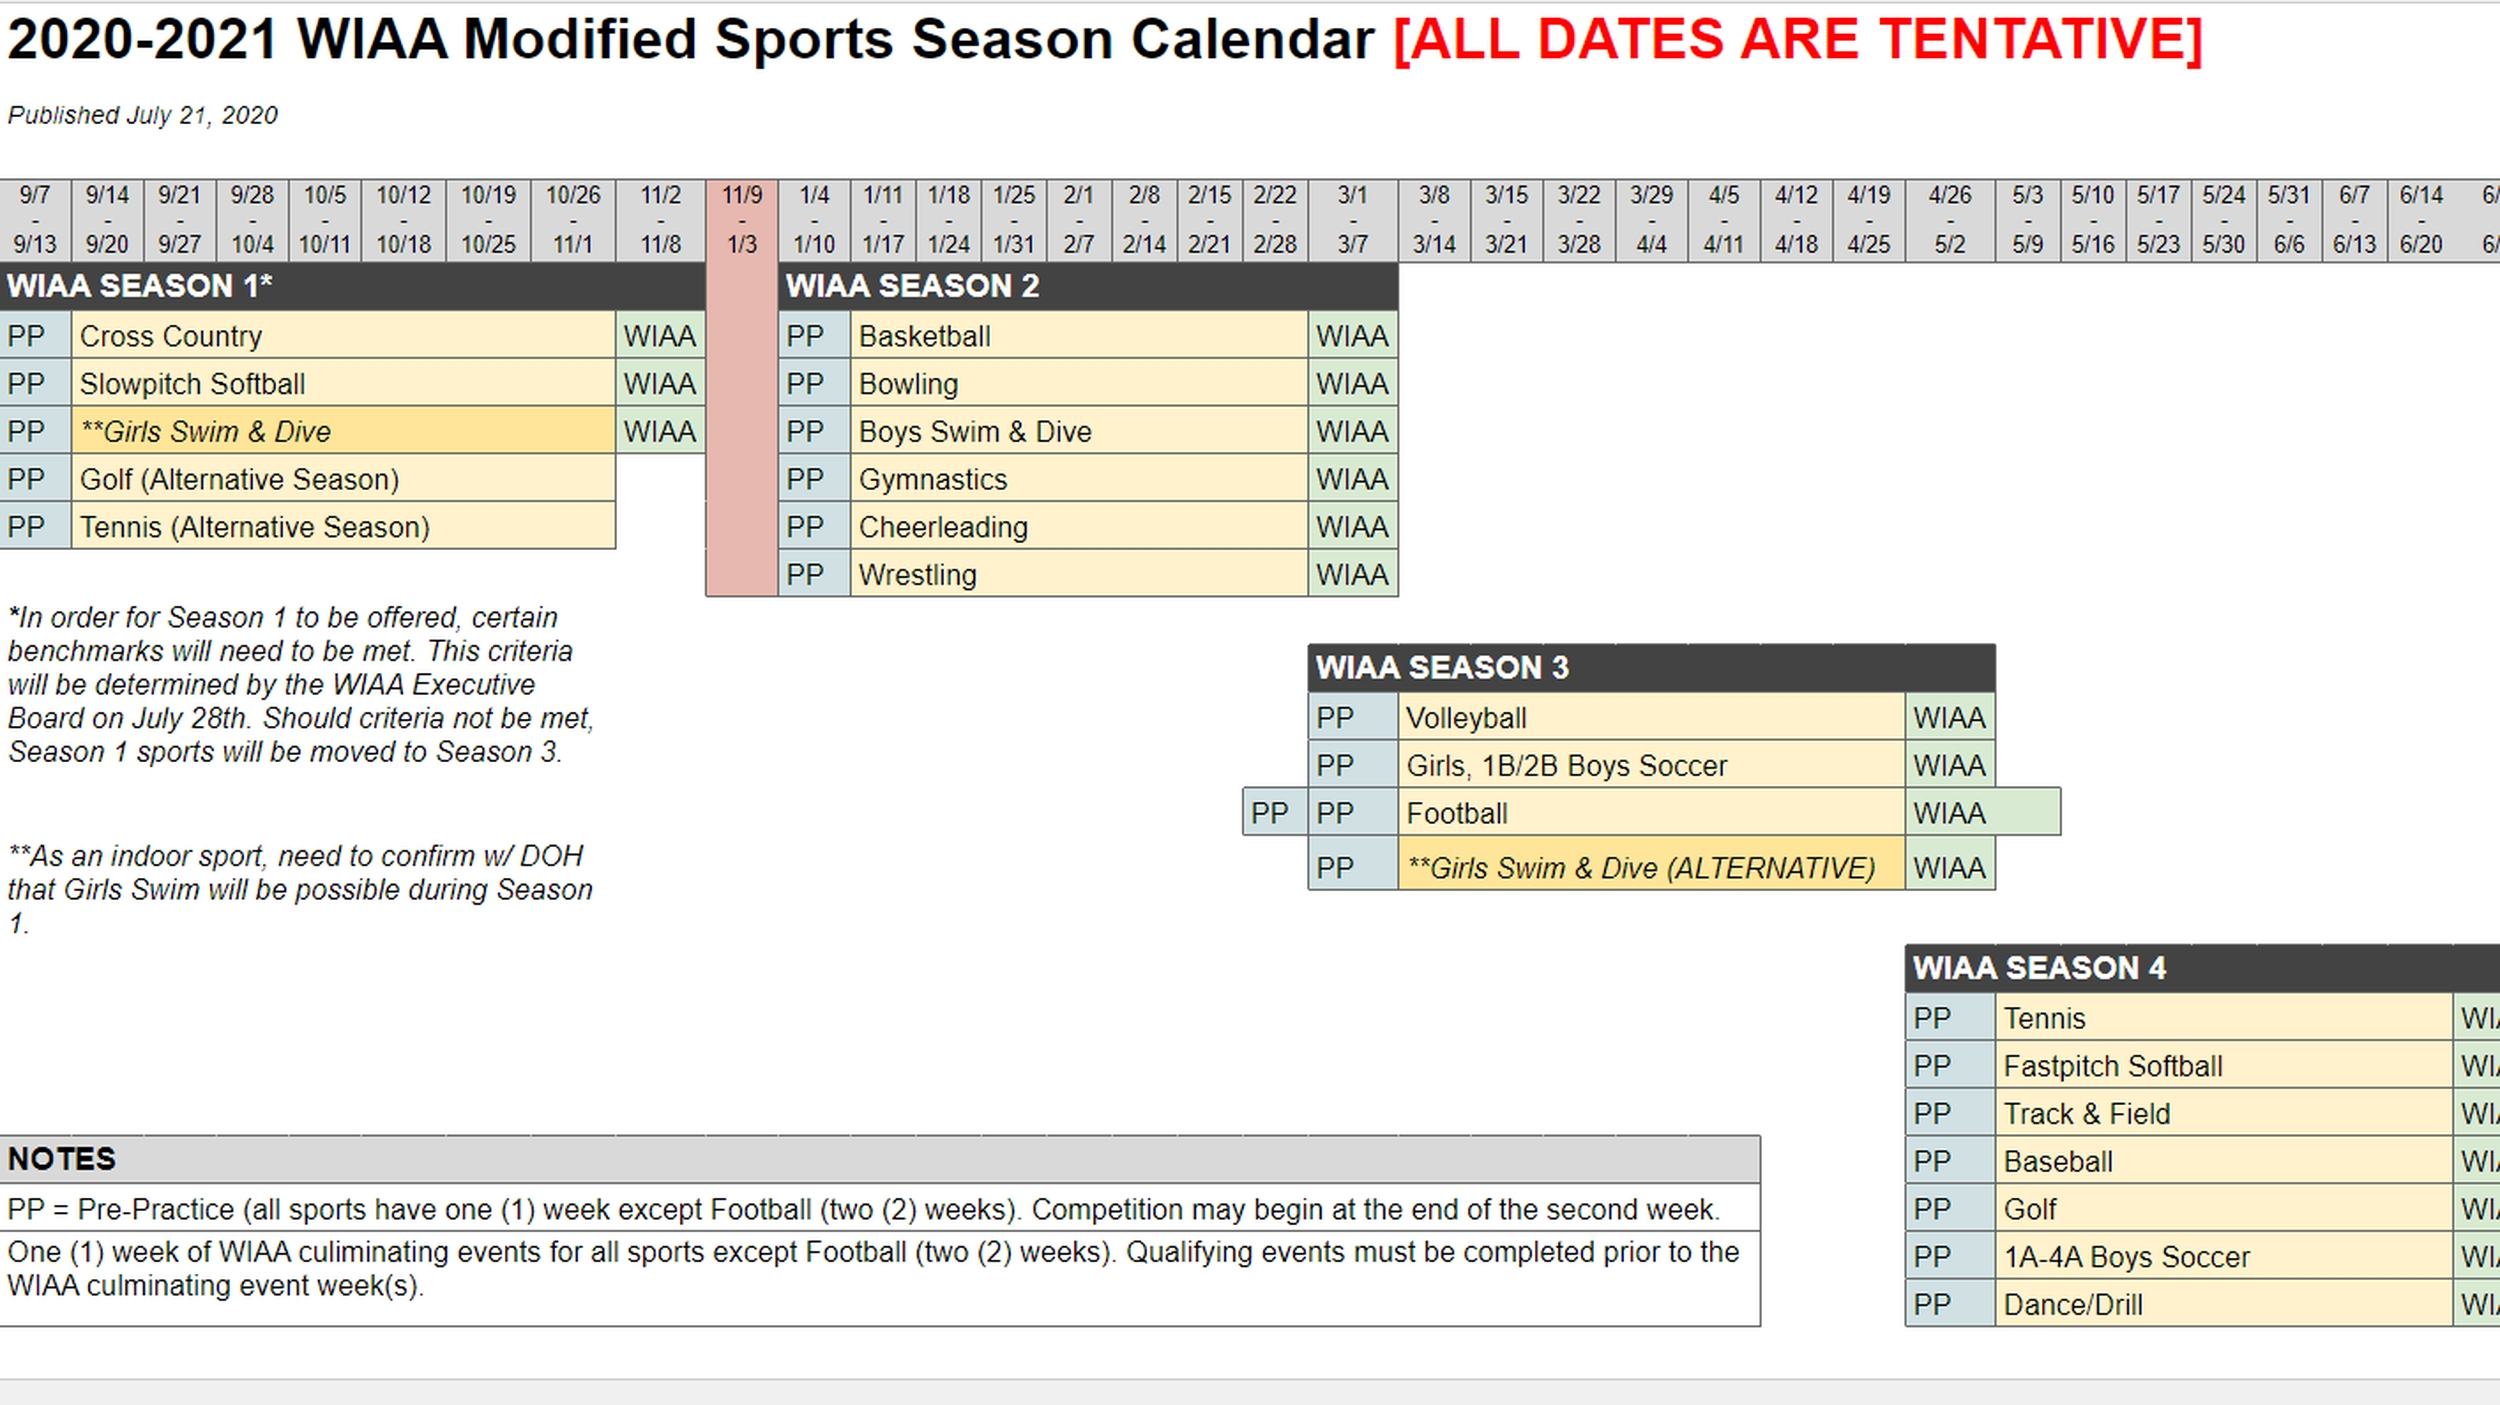 Wiaa Modifies 2020-21 Sports Calendar; Football, Volleyball